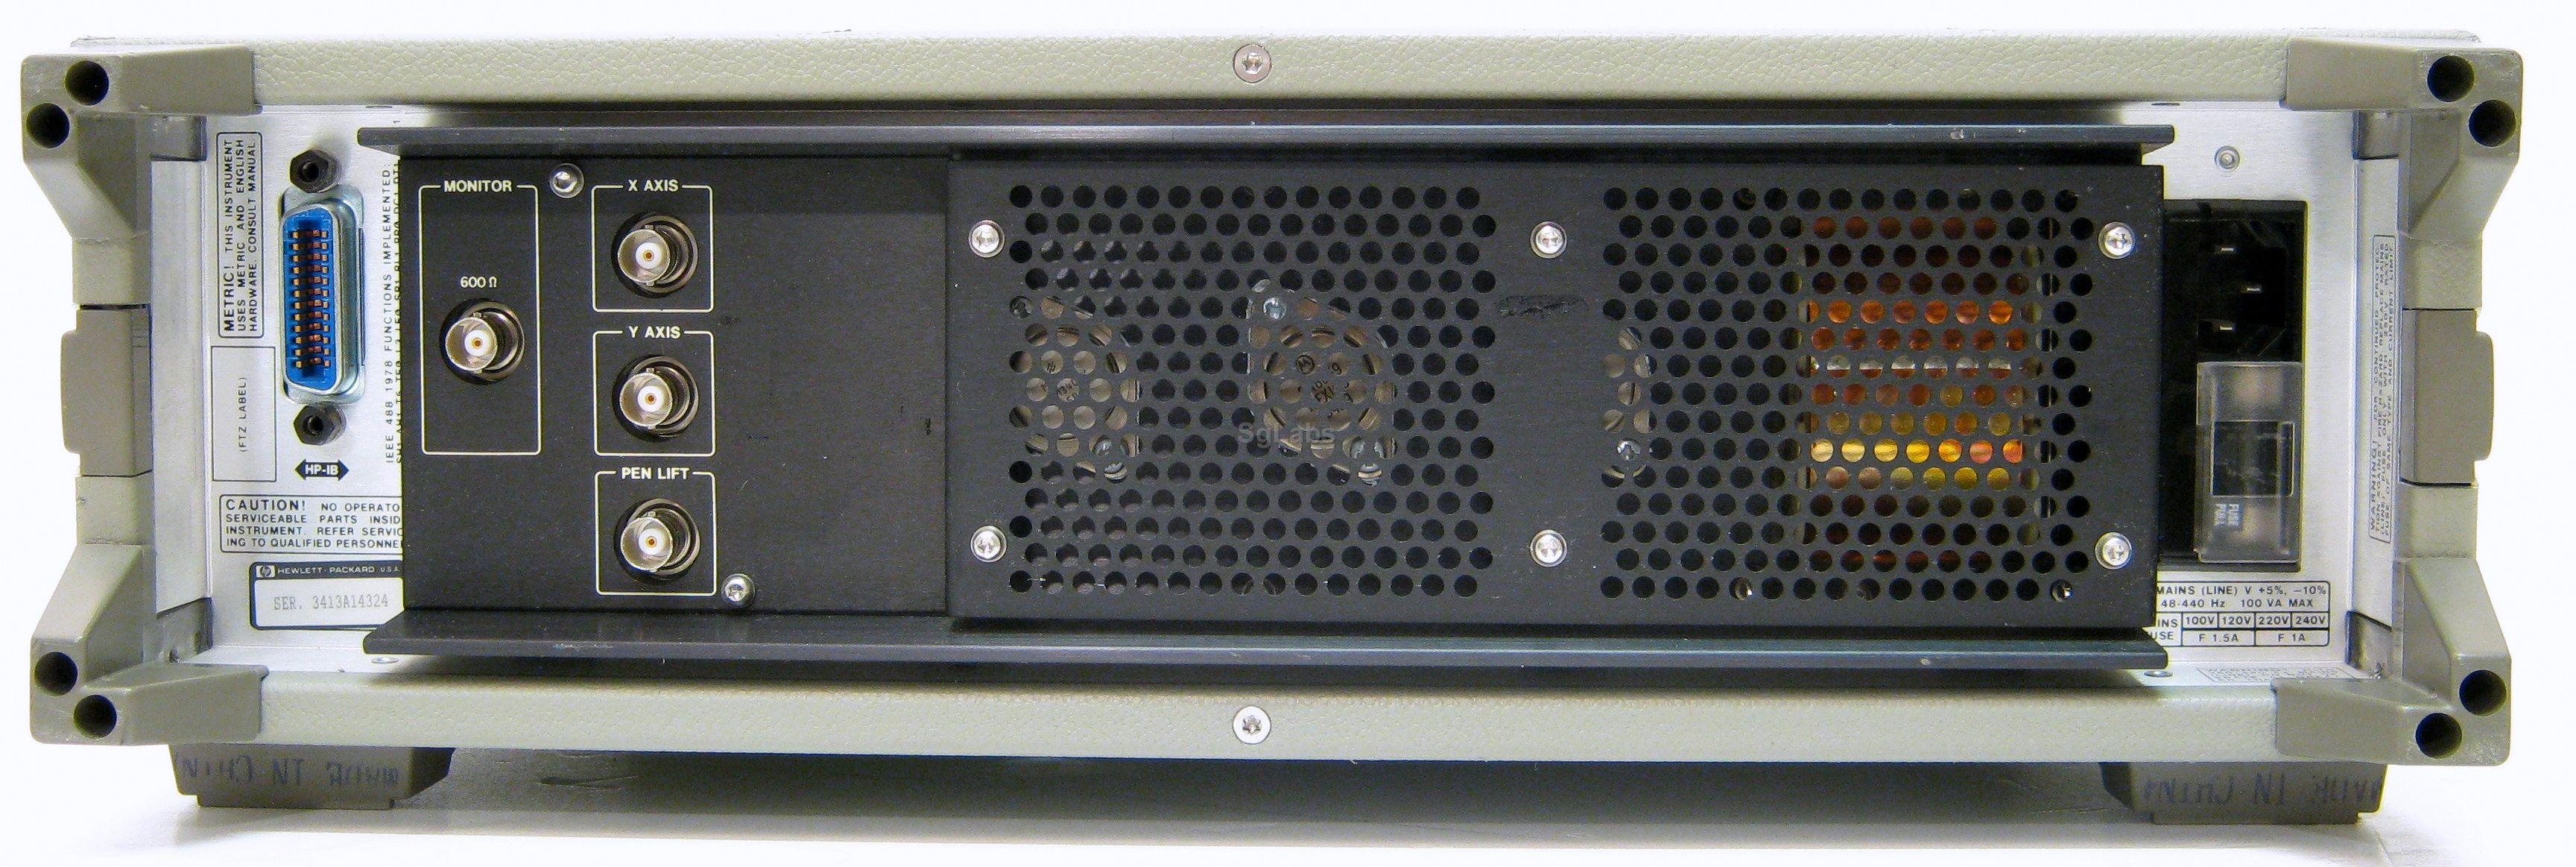 Hp Agilent Keysight 8903b